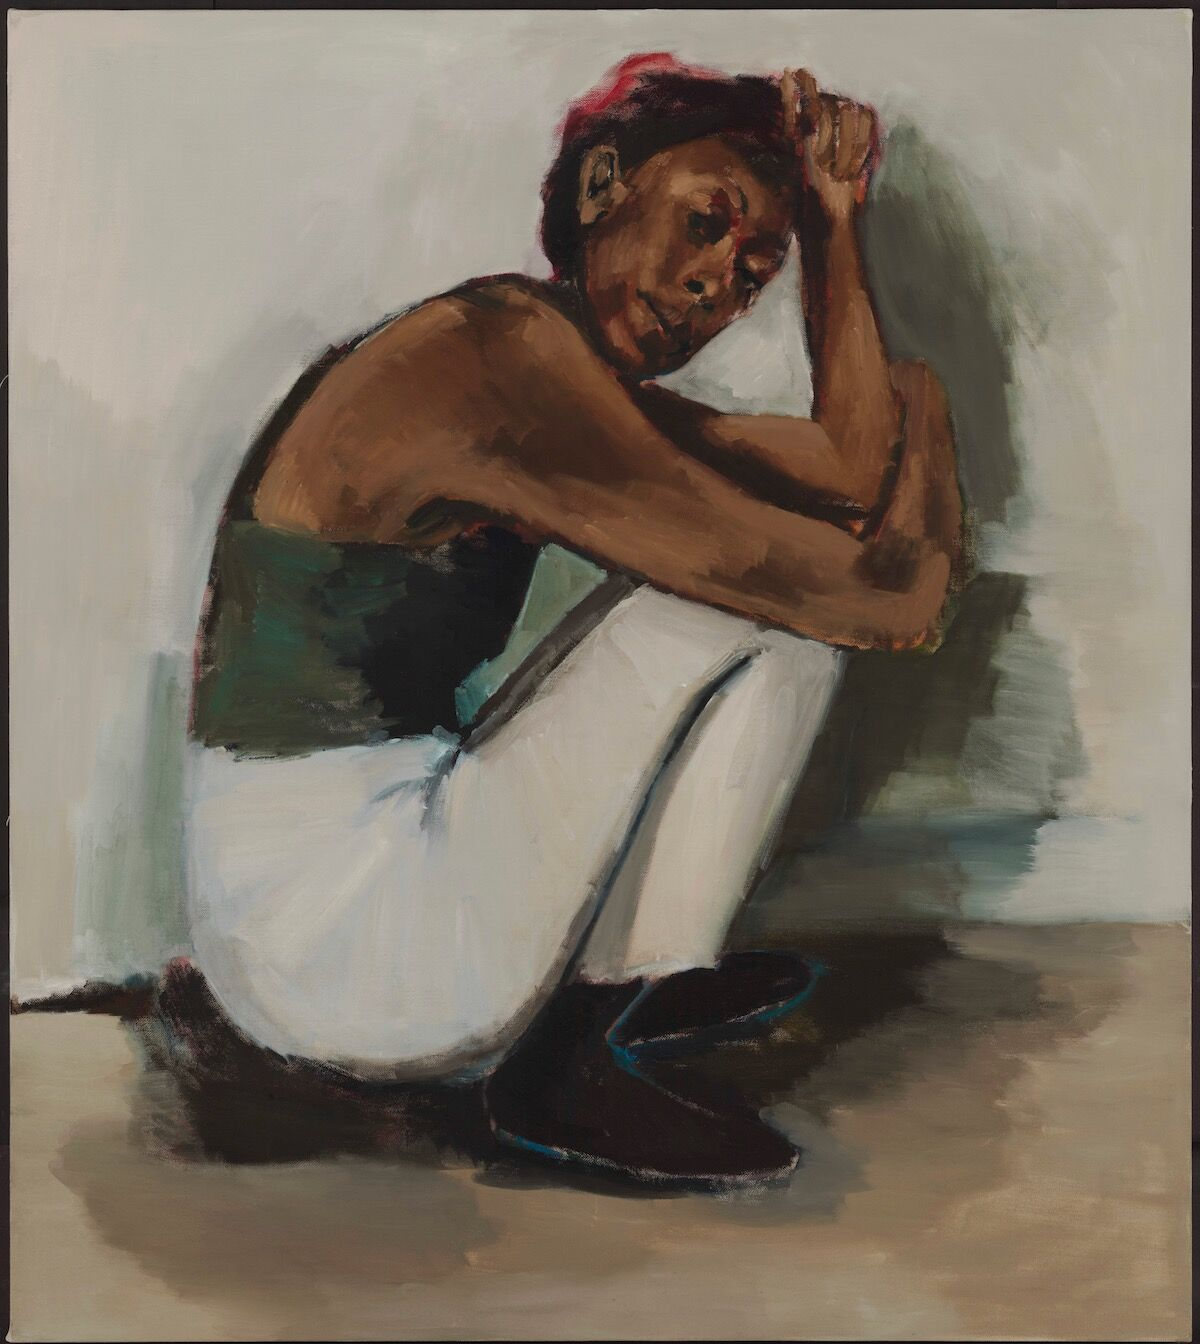 Lynette Yiadom-Boakye, Radical Trysts, 2018, oil on linen. Courtesy Corvi-Mora, London and Jack Shainman Gallery, New York; photo © Marcus Leith.